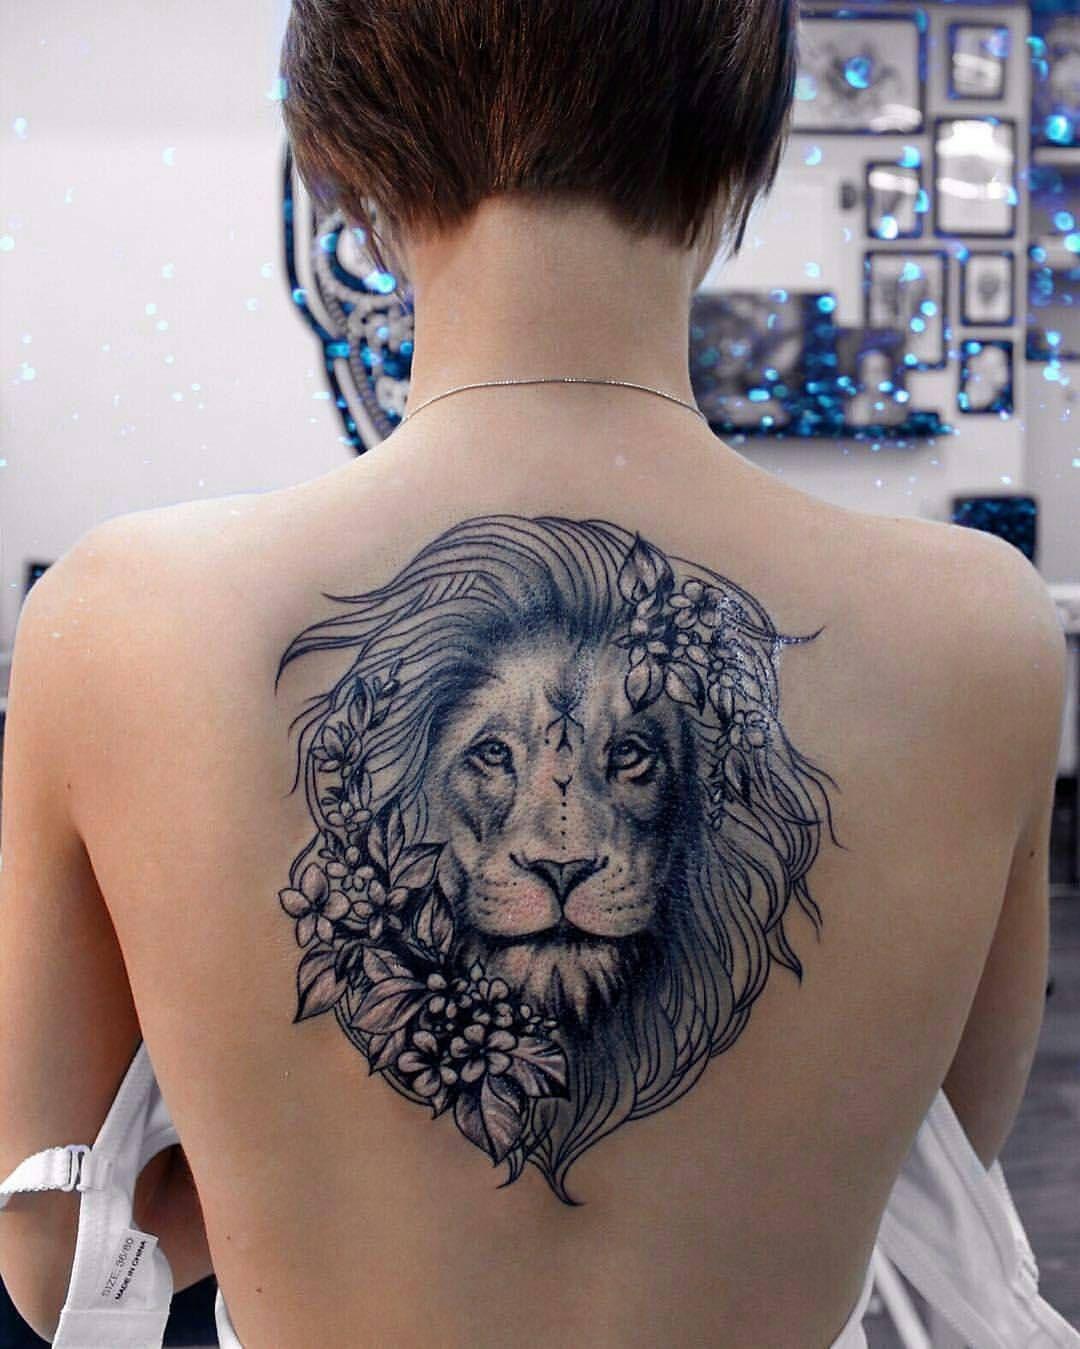 Lion back tattoo Tatoeage ideeën, Tatoeages, Leeuwentatoeage